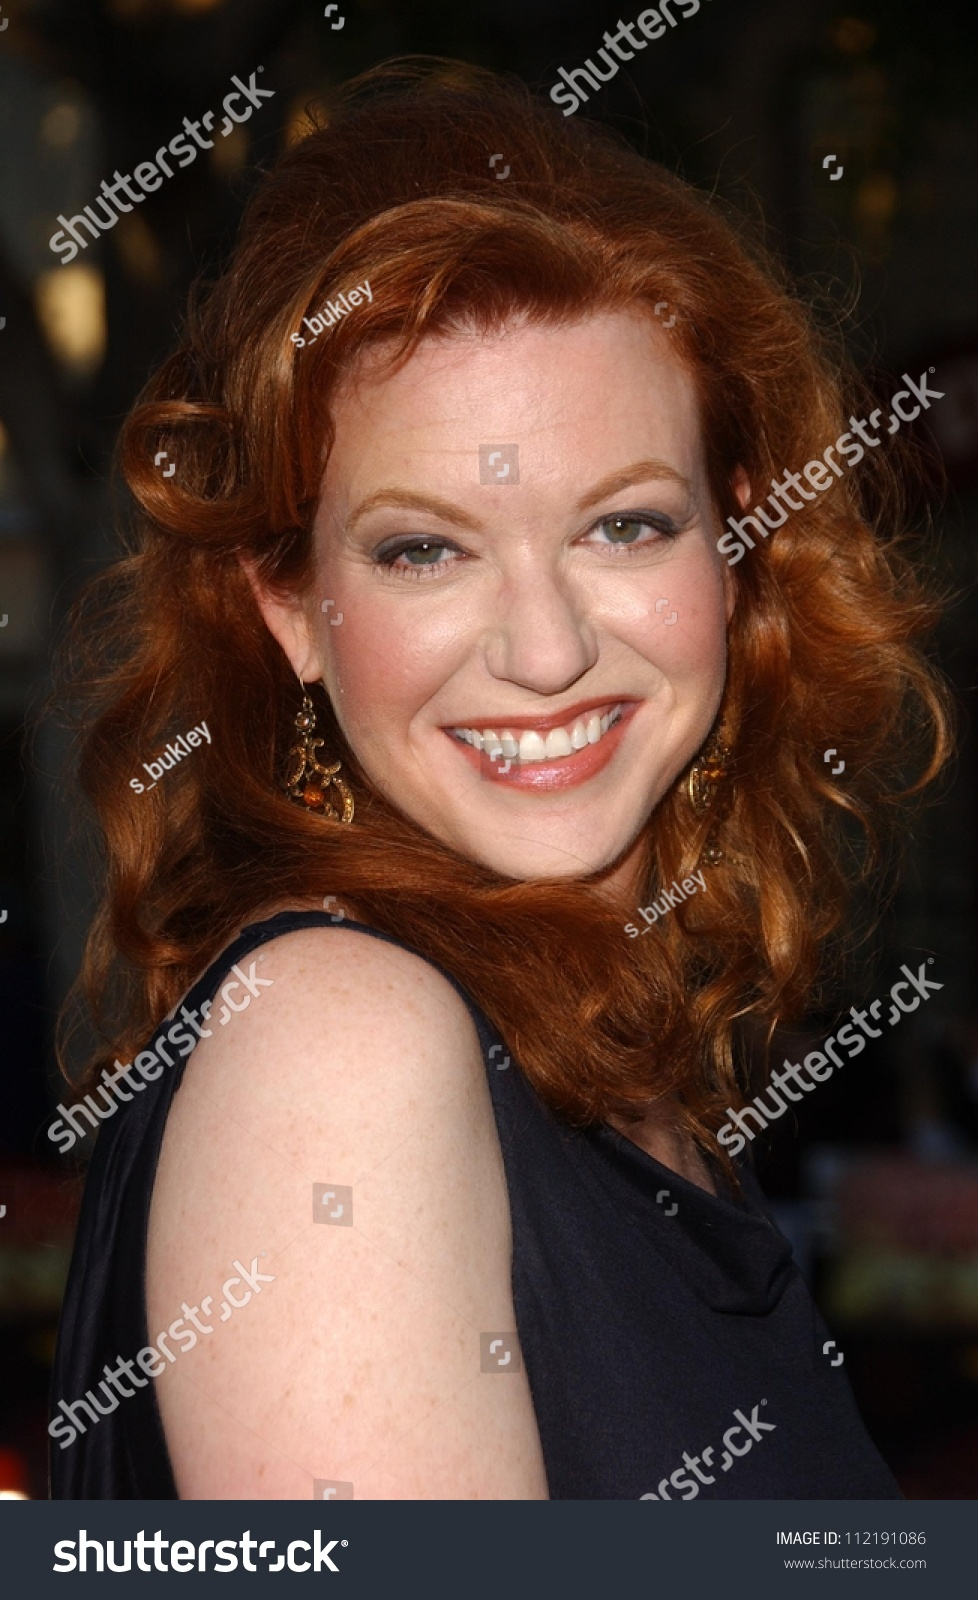 Janina San Miguel (b. 1990),Michele Hicks Erotic pic Amy Hunter,Courtenay Taylor